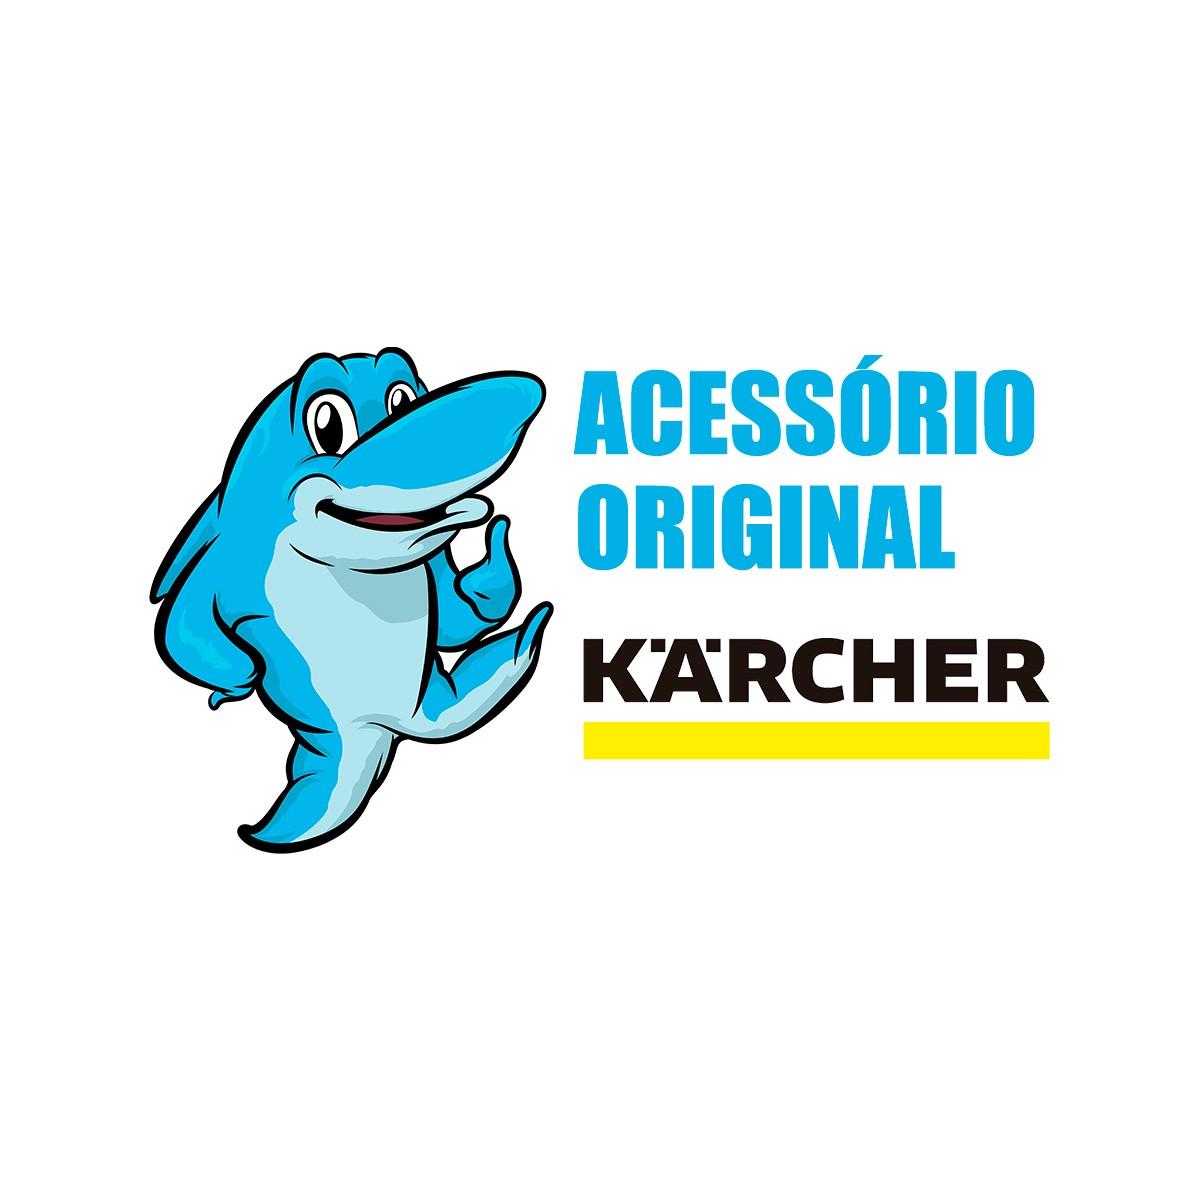 Bico Turbo para Lavadora de Alta Pressão Karcher HD 660 (220v), HD 800, HD 895, HD 1090, HDS 10/18 Original